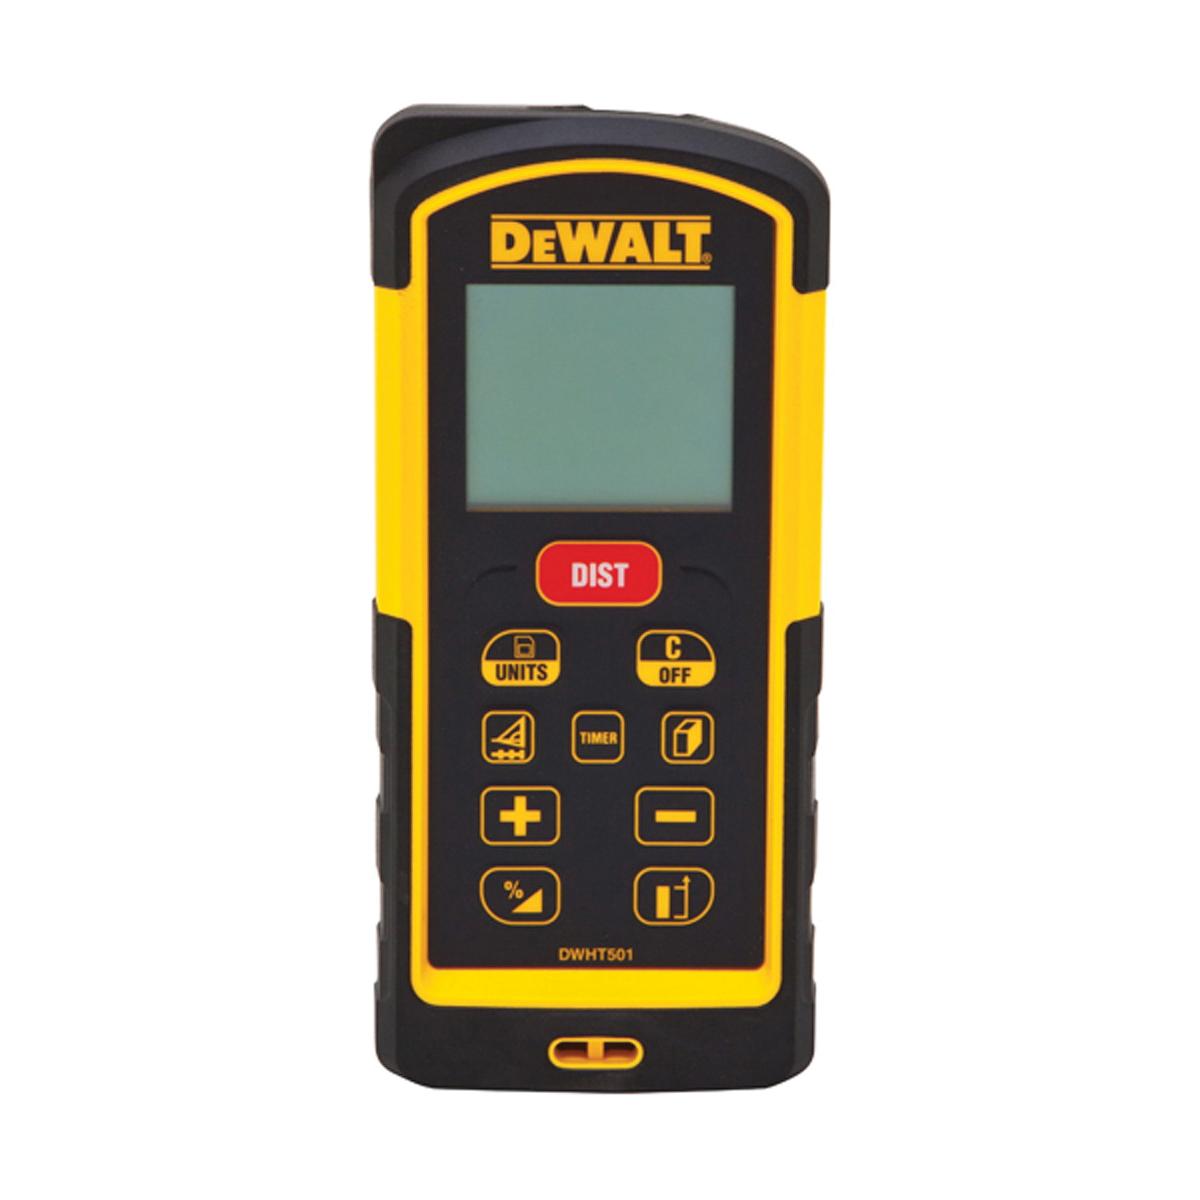 DeWALT® DW03101 Laser Distance Meter, Black/Yellow, +/-1/32 in Accuracy, (2) AAA Batteries, LCD Display